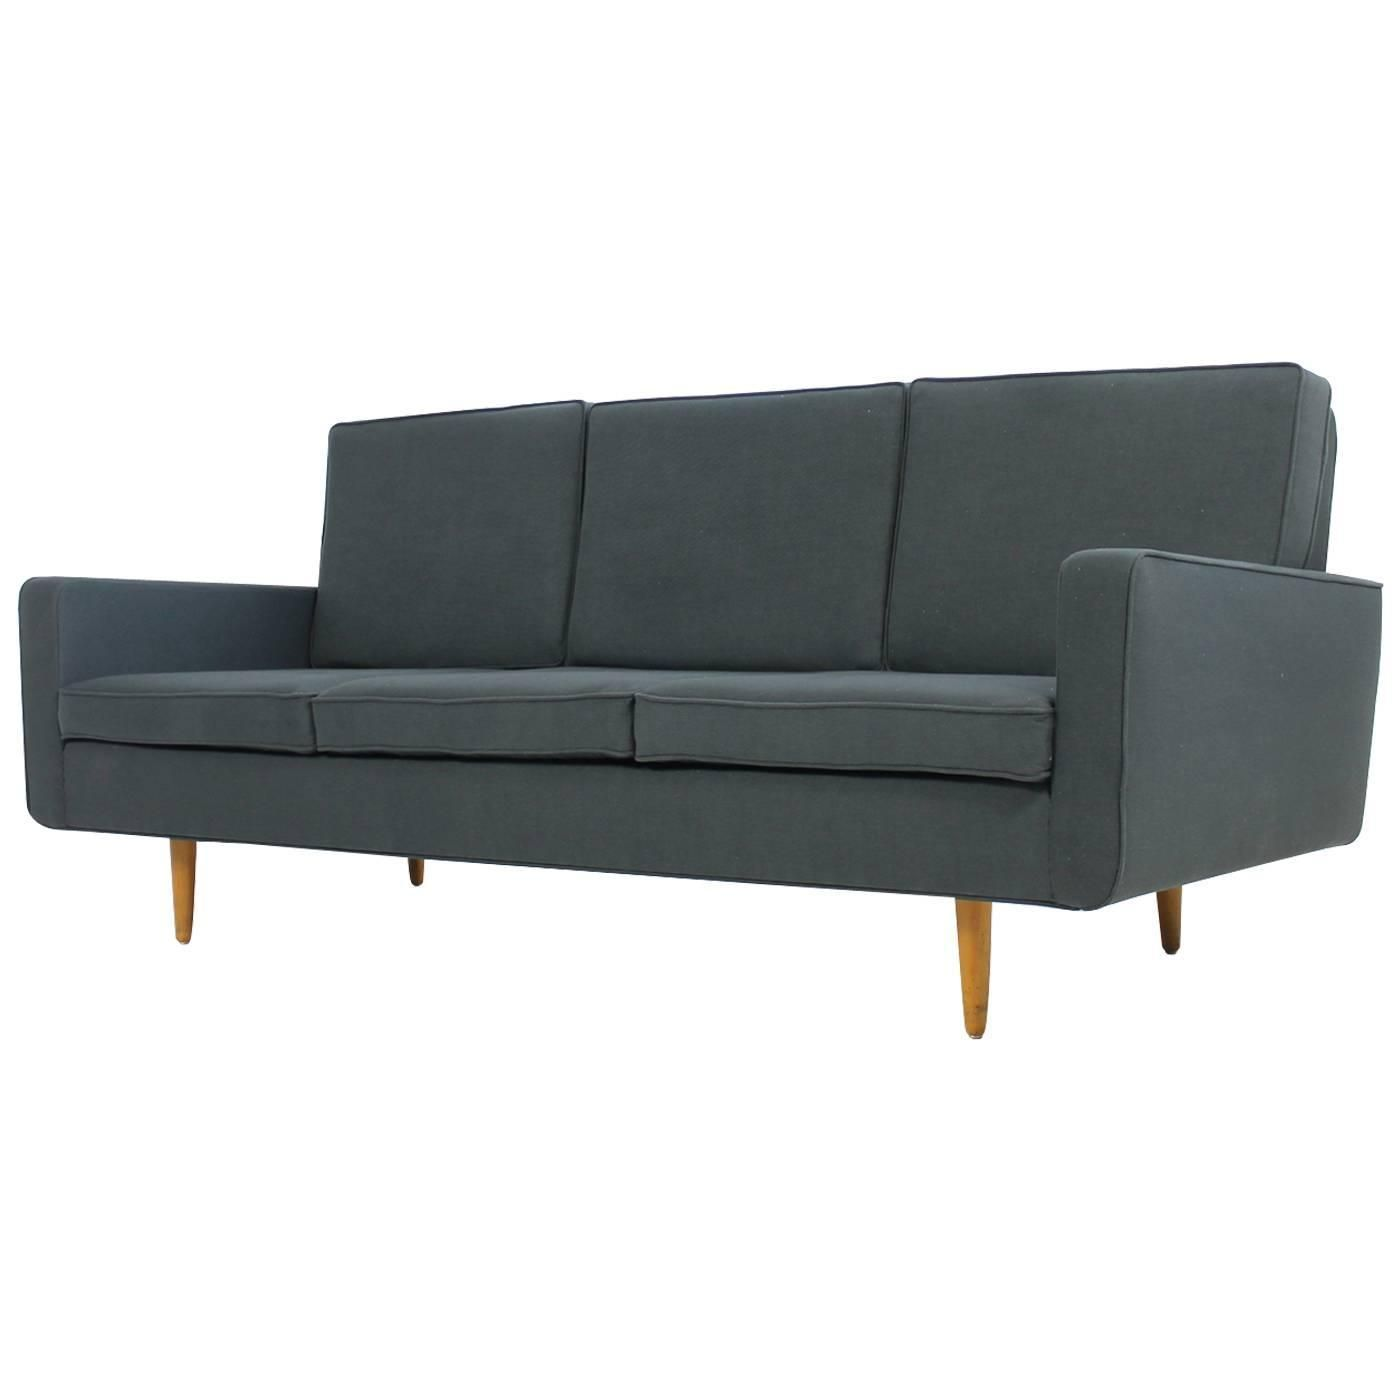 Rare 1950s Florence Knoll Sofa Mod 26 Knoll International Mid